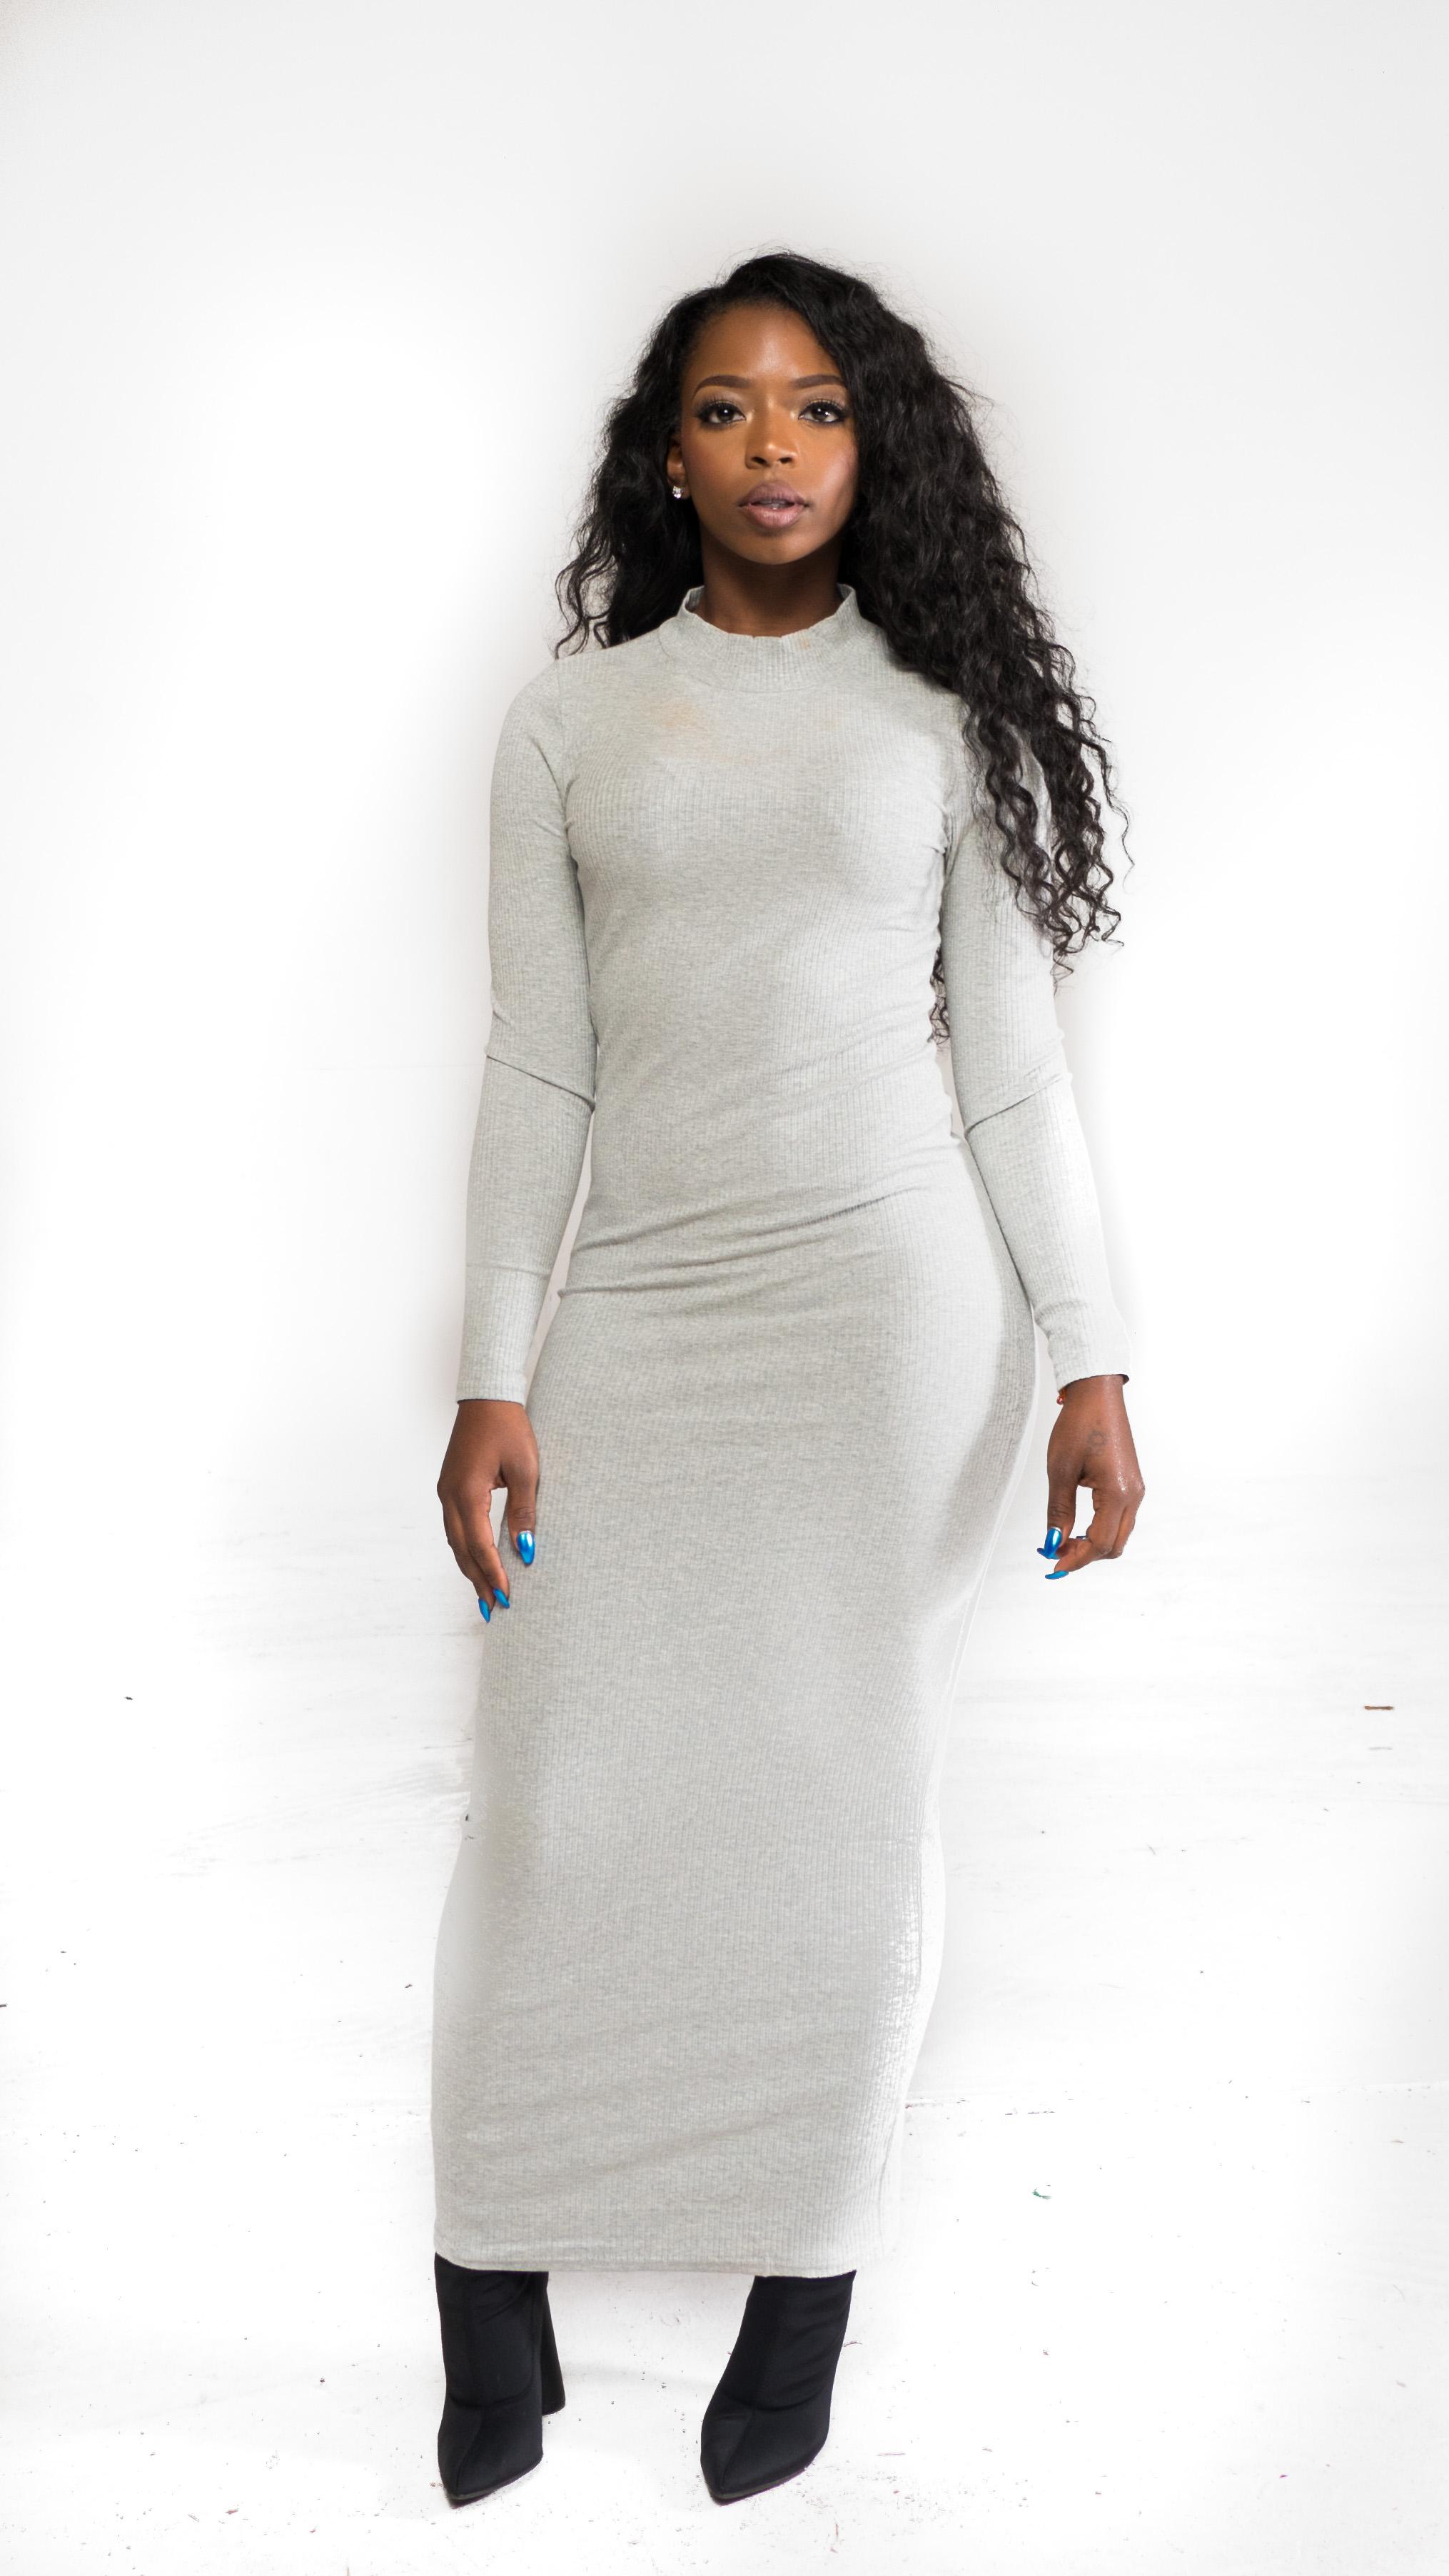 isis clothing - product shots-1580509.jpg